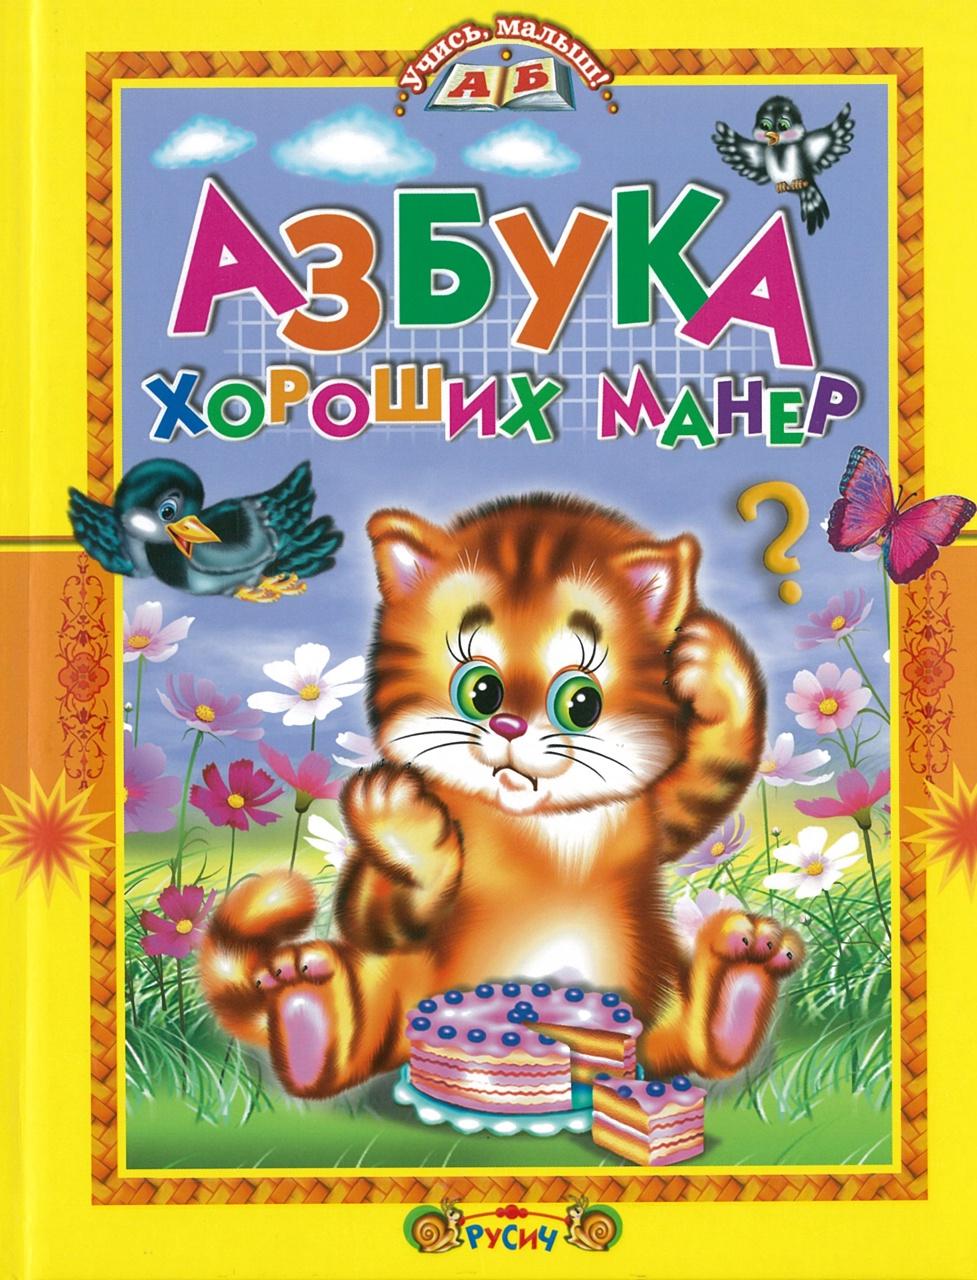 без автора Книга Азбука хороших манер Русич